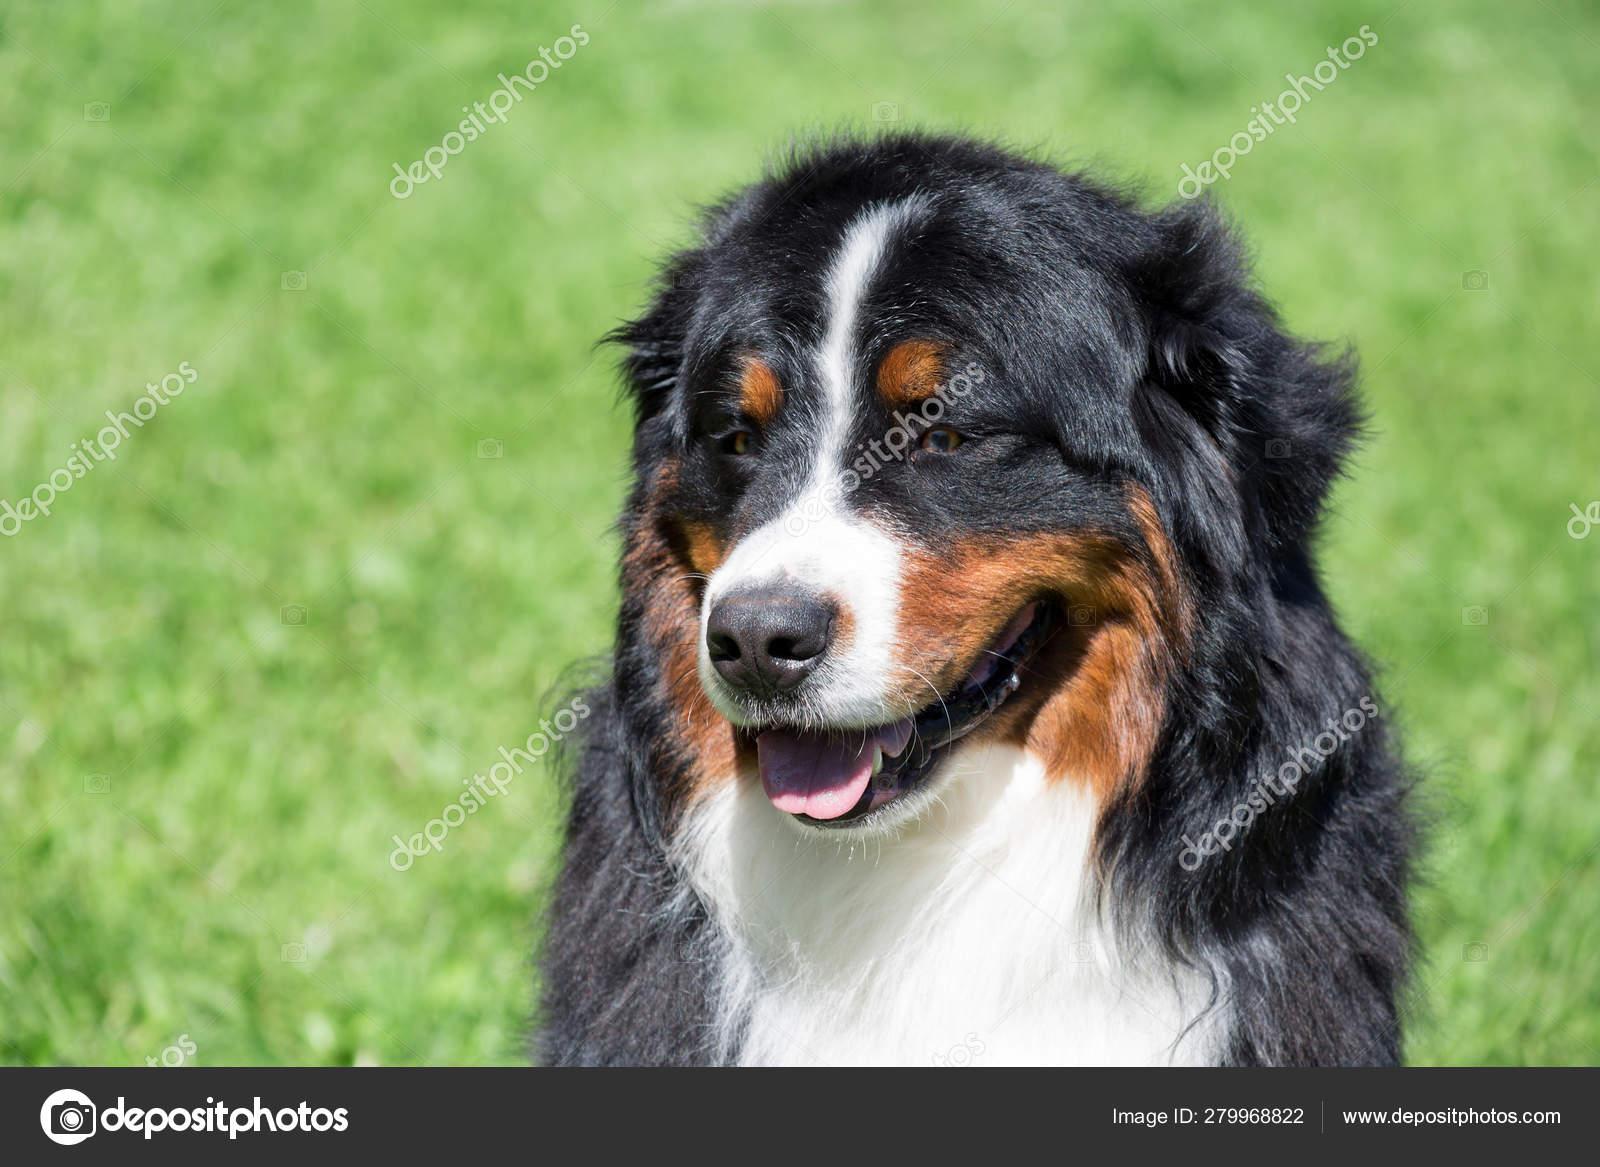 Cute Bernese Mountain Dog Puppy Is Sitting On A Green Grass Berner Sennenhund Or Bernese Cattle Dog Stock Photo C Sergeytikhomirov 279968822